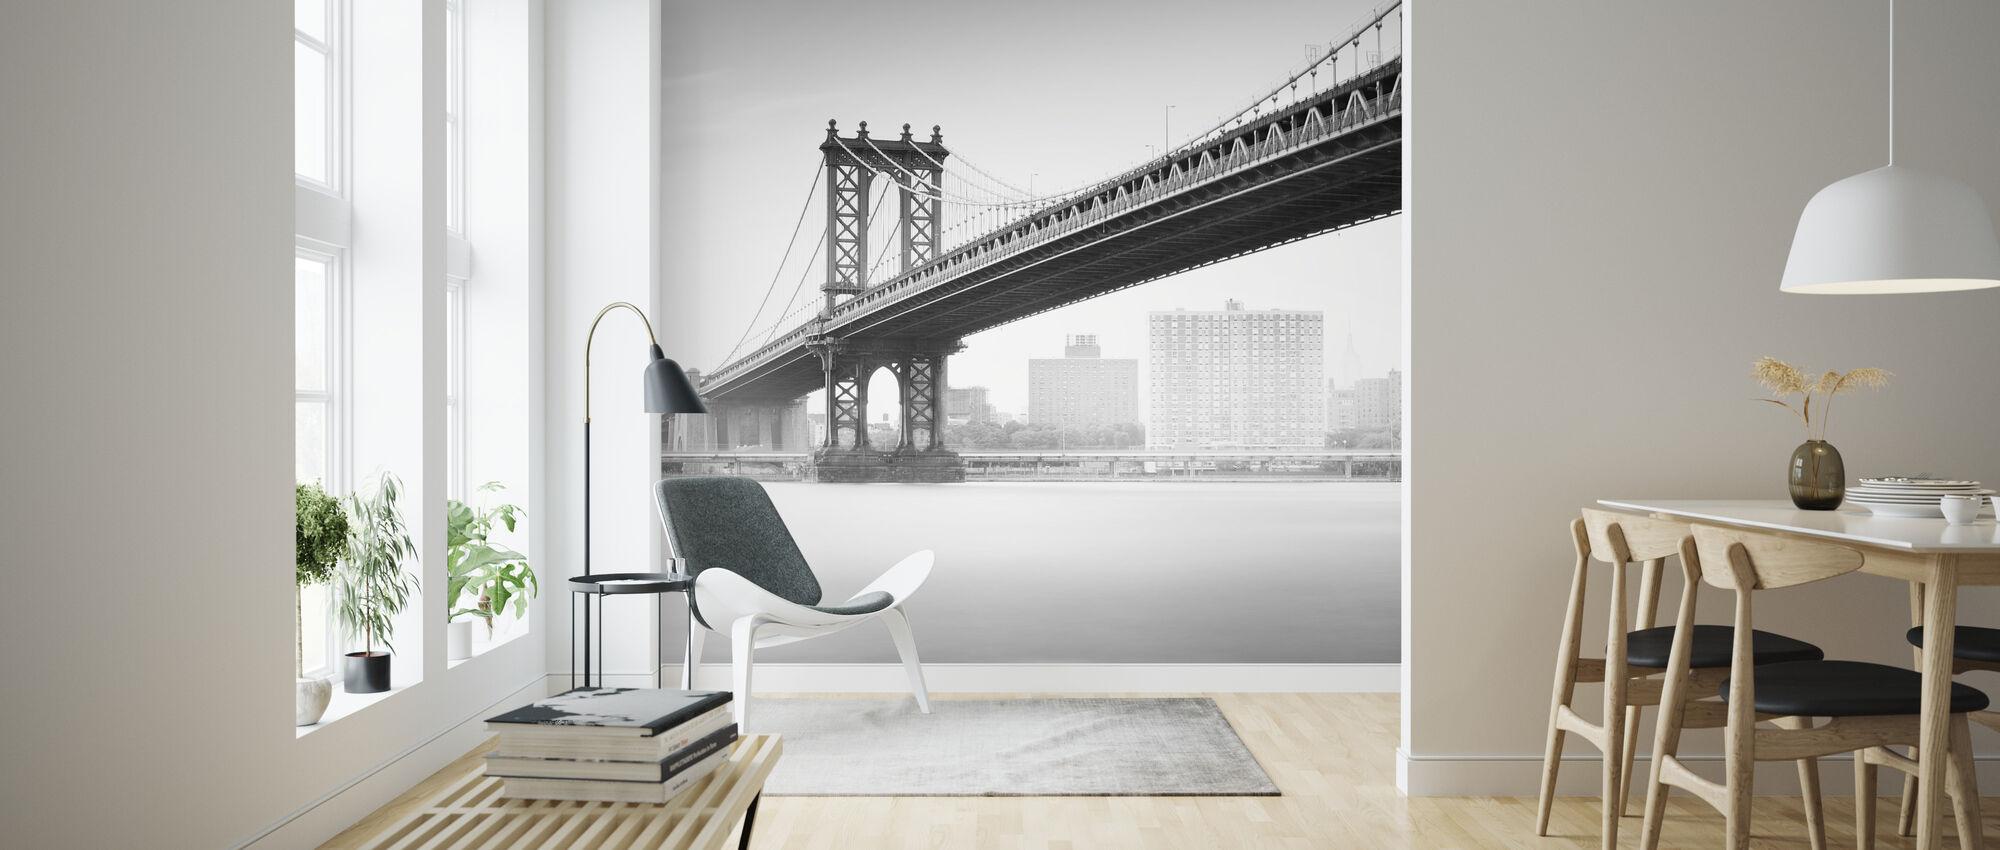 Study of Manhattan Bridge - Wallpaper - Living Room